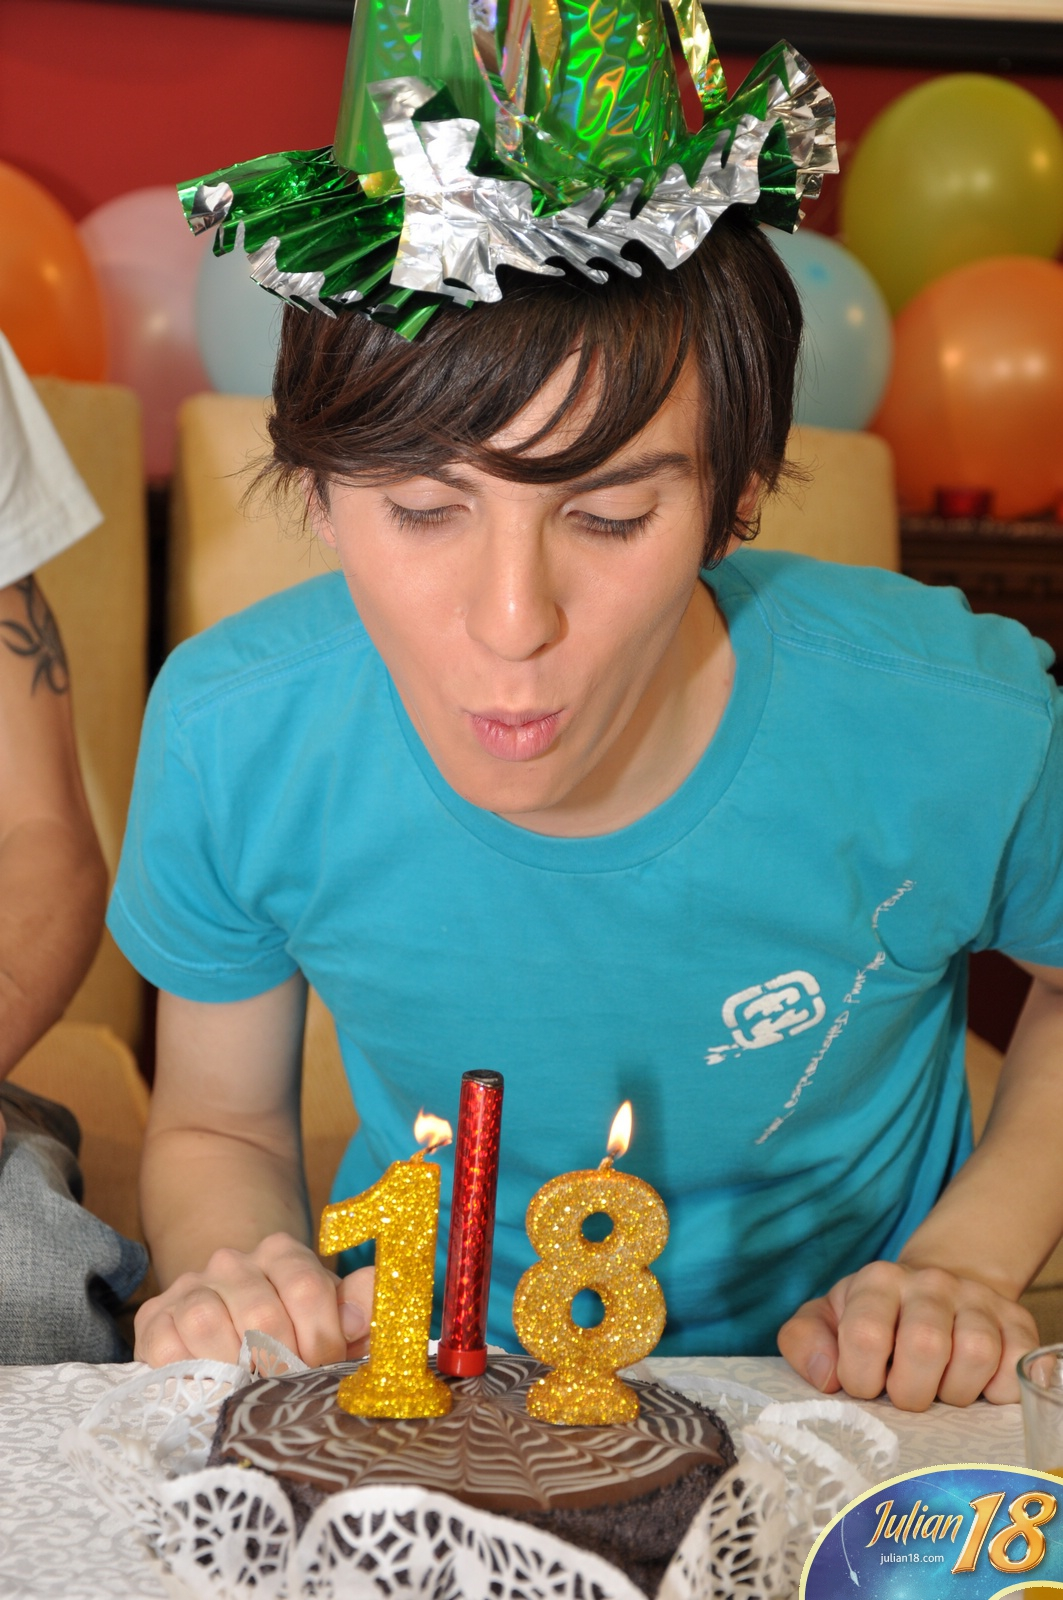 Gay boy birthday party